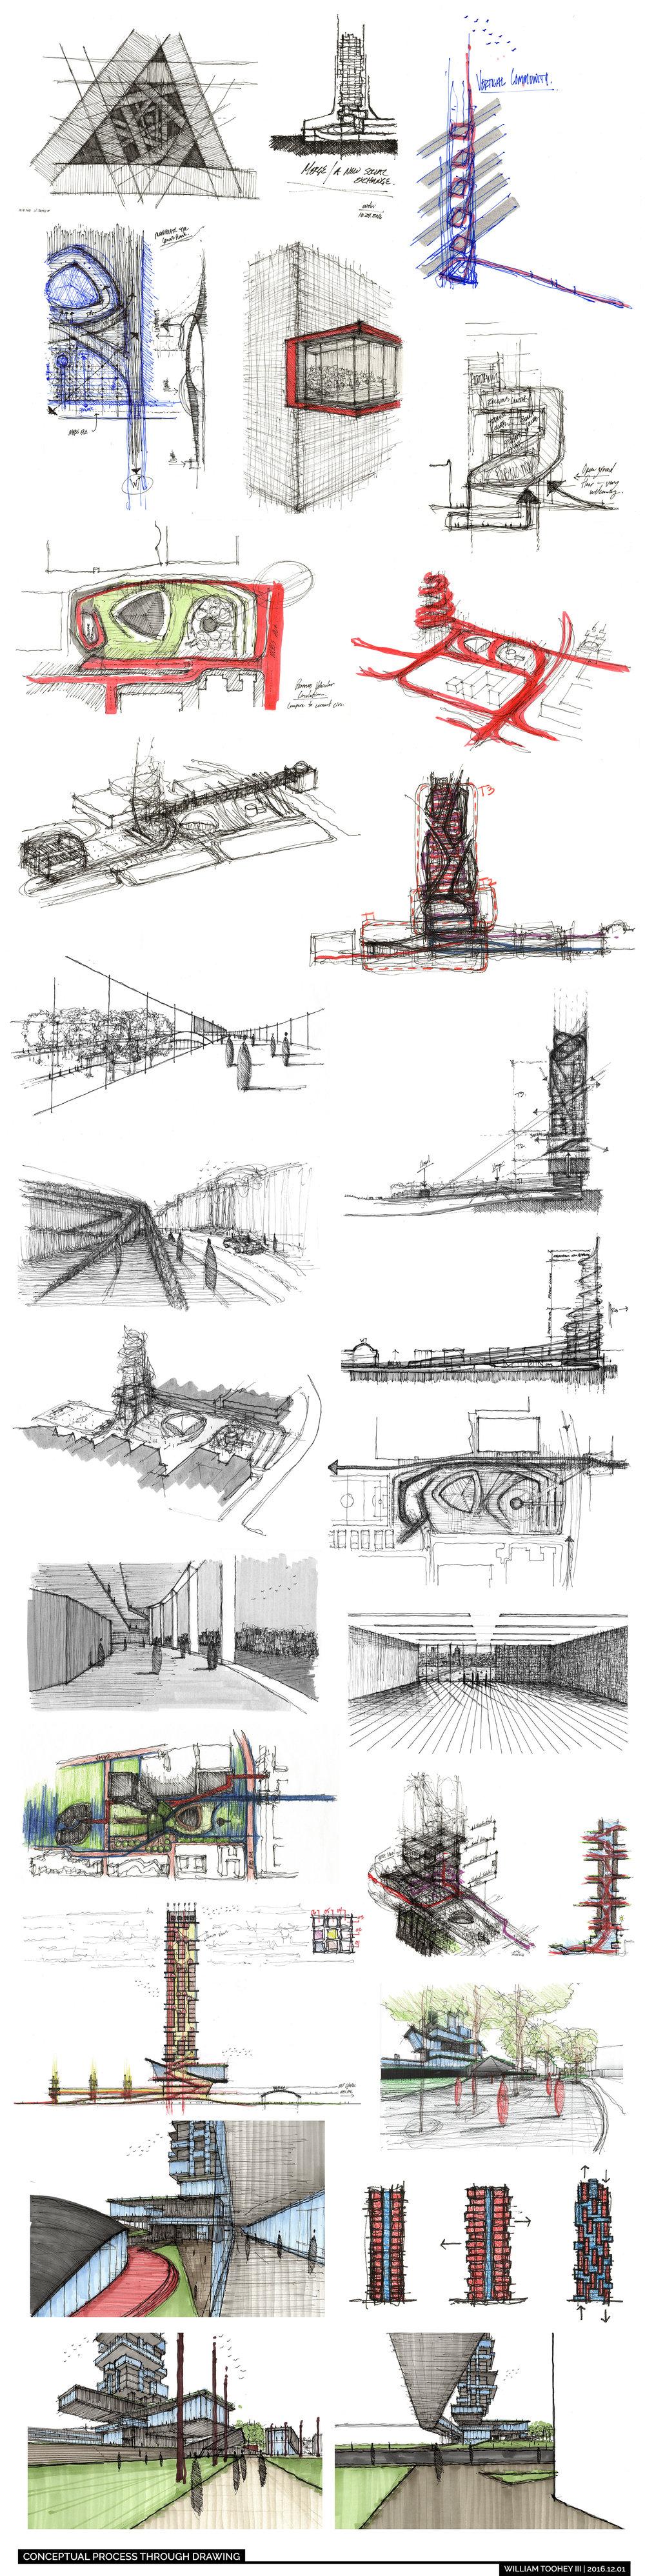 Final_18x72_03 Sketches.jpg